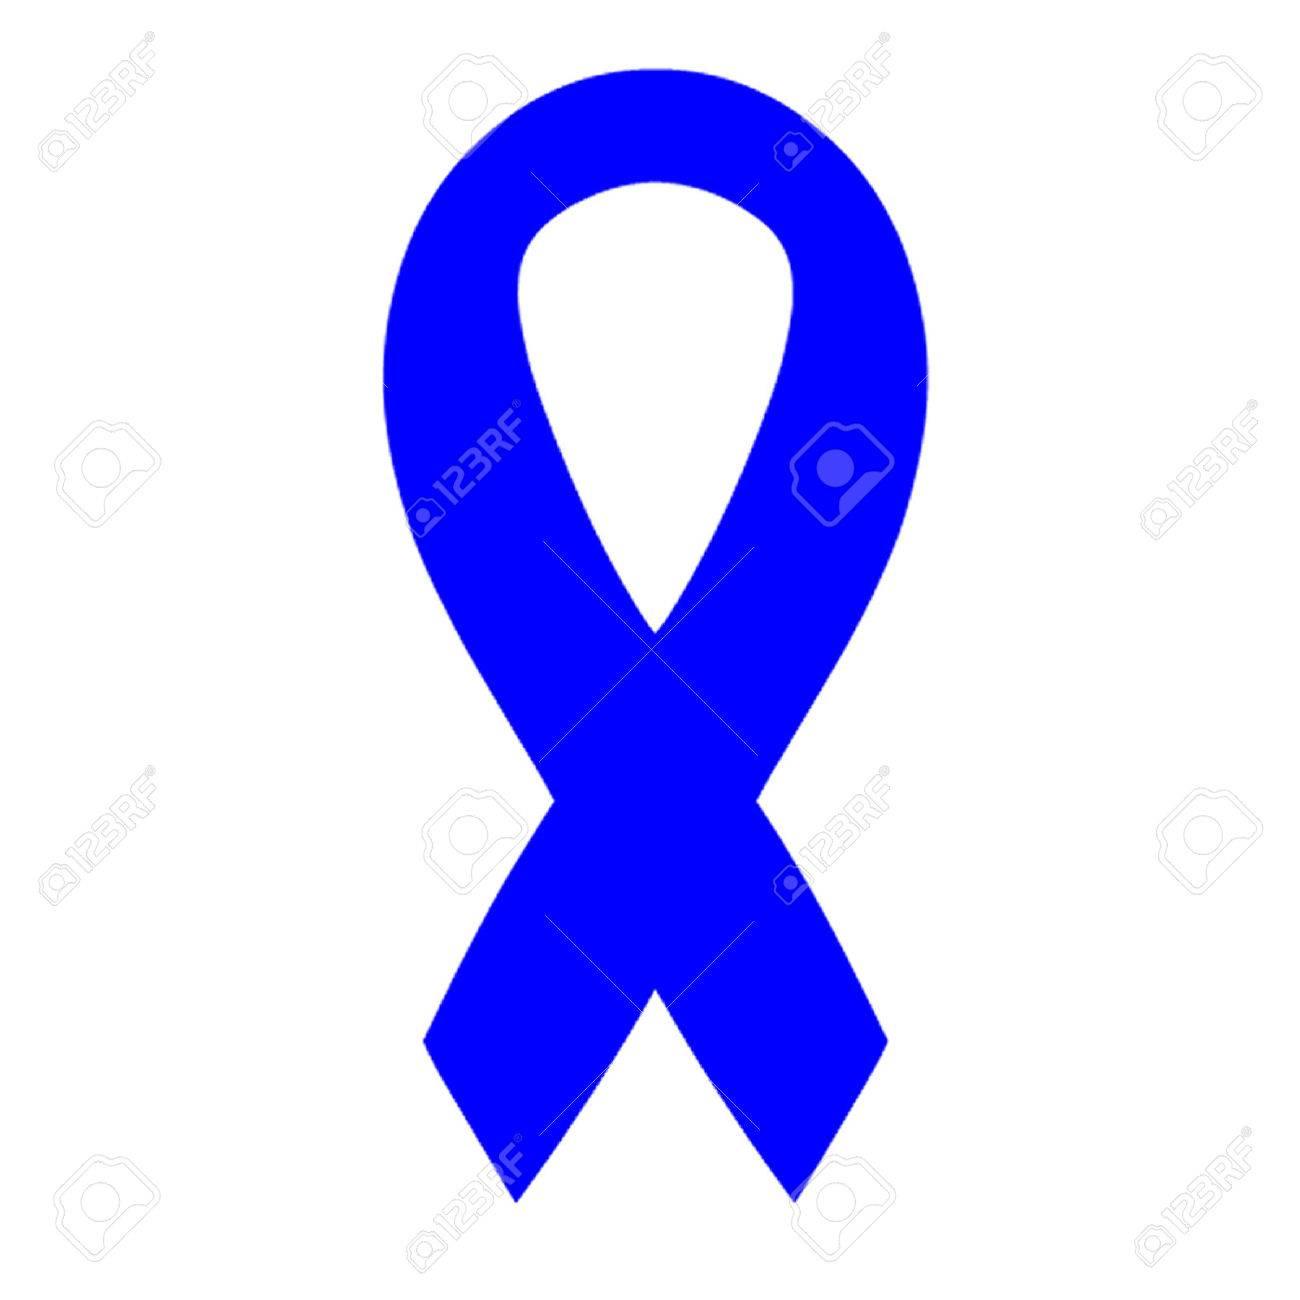 Blue Awareness Ribbon Stock Vector - 27372047